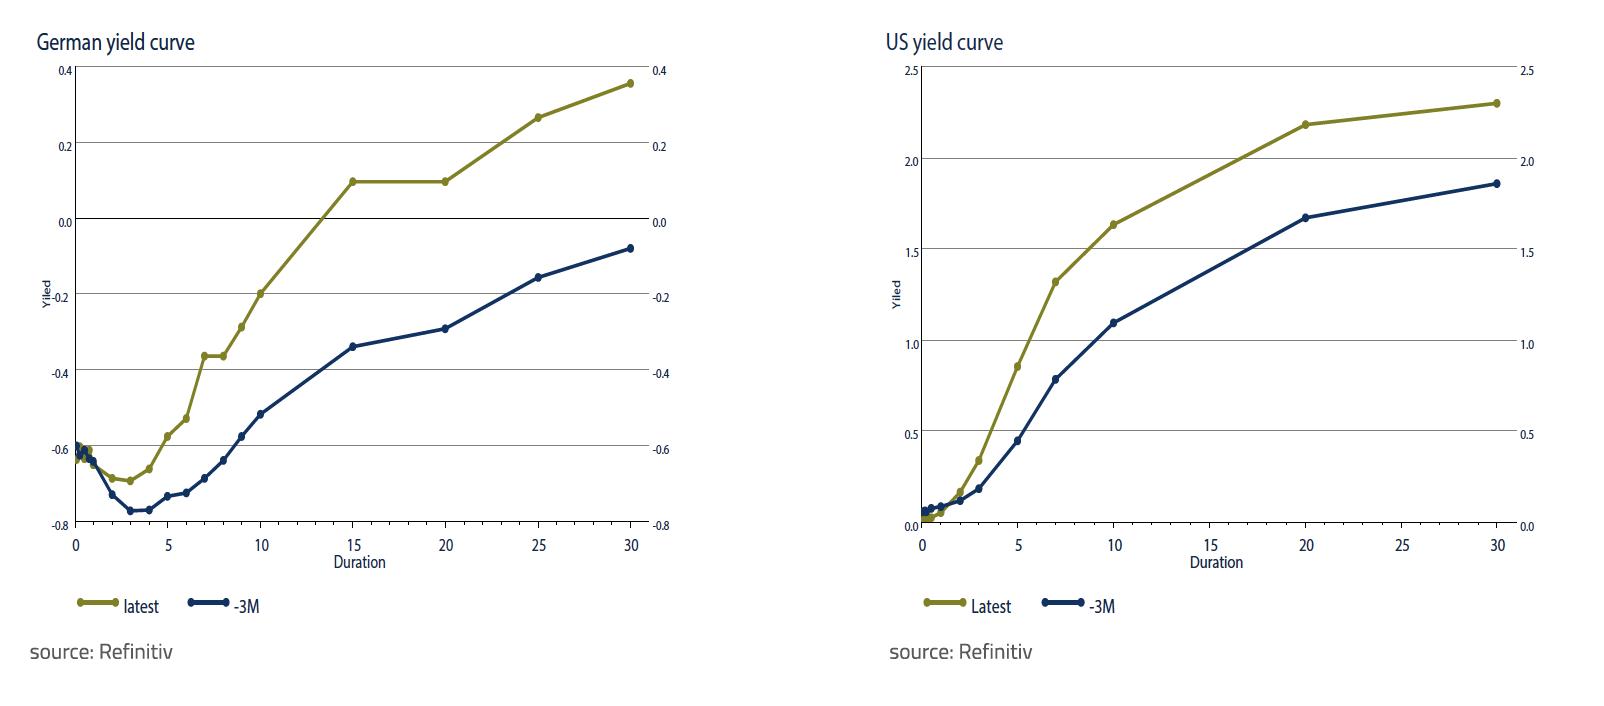 German yield curve